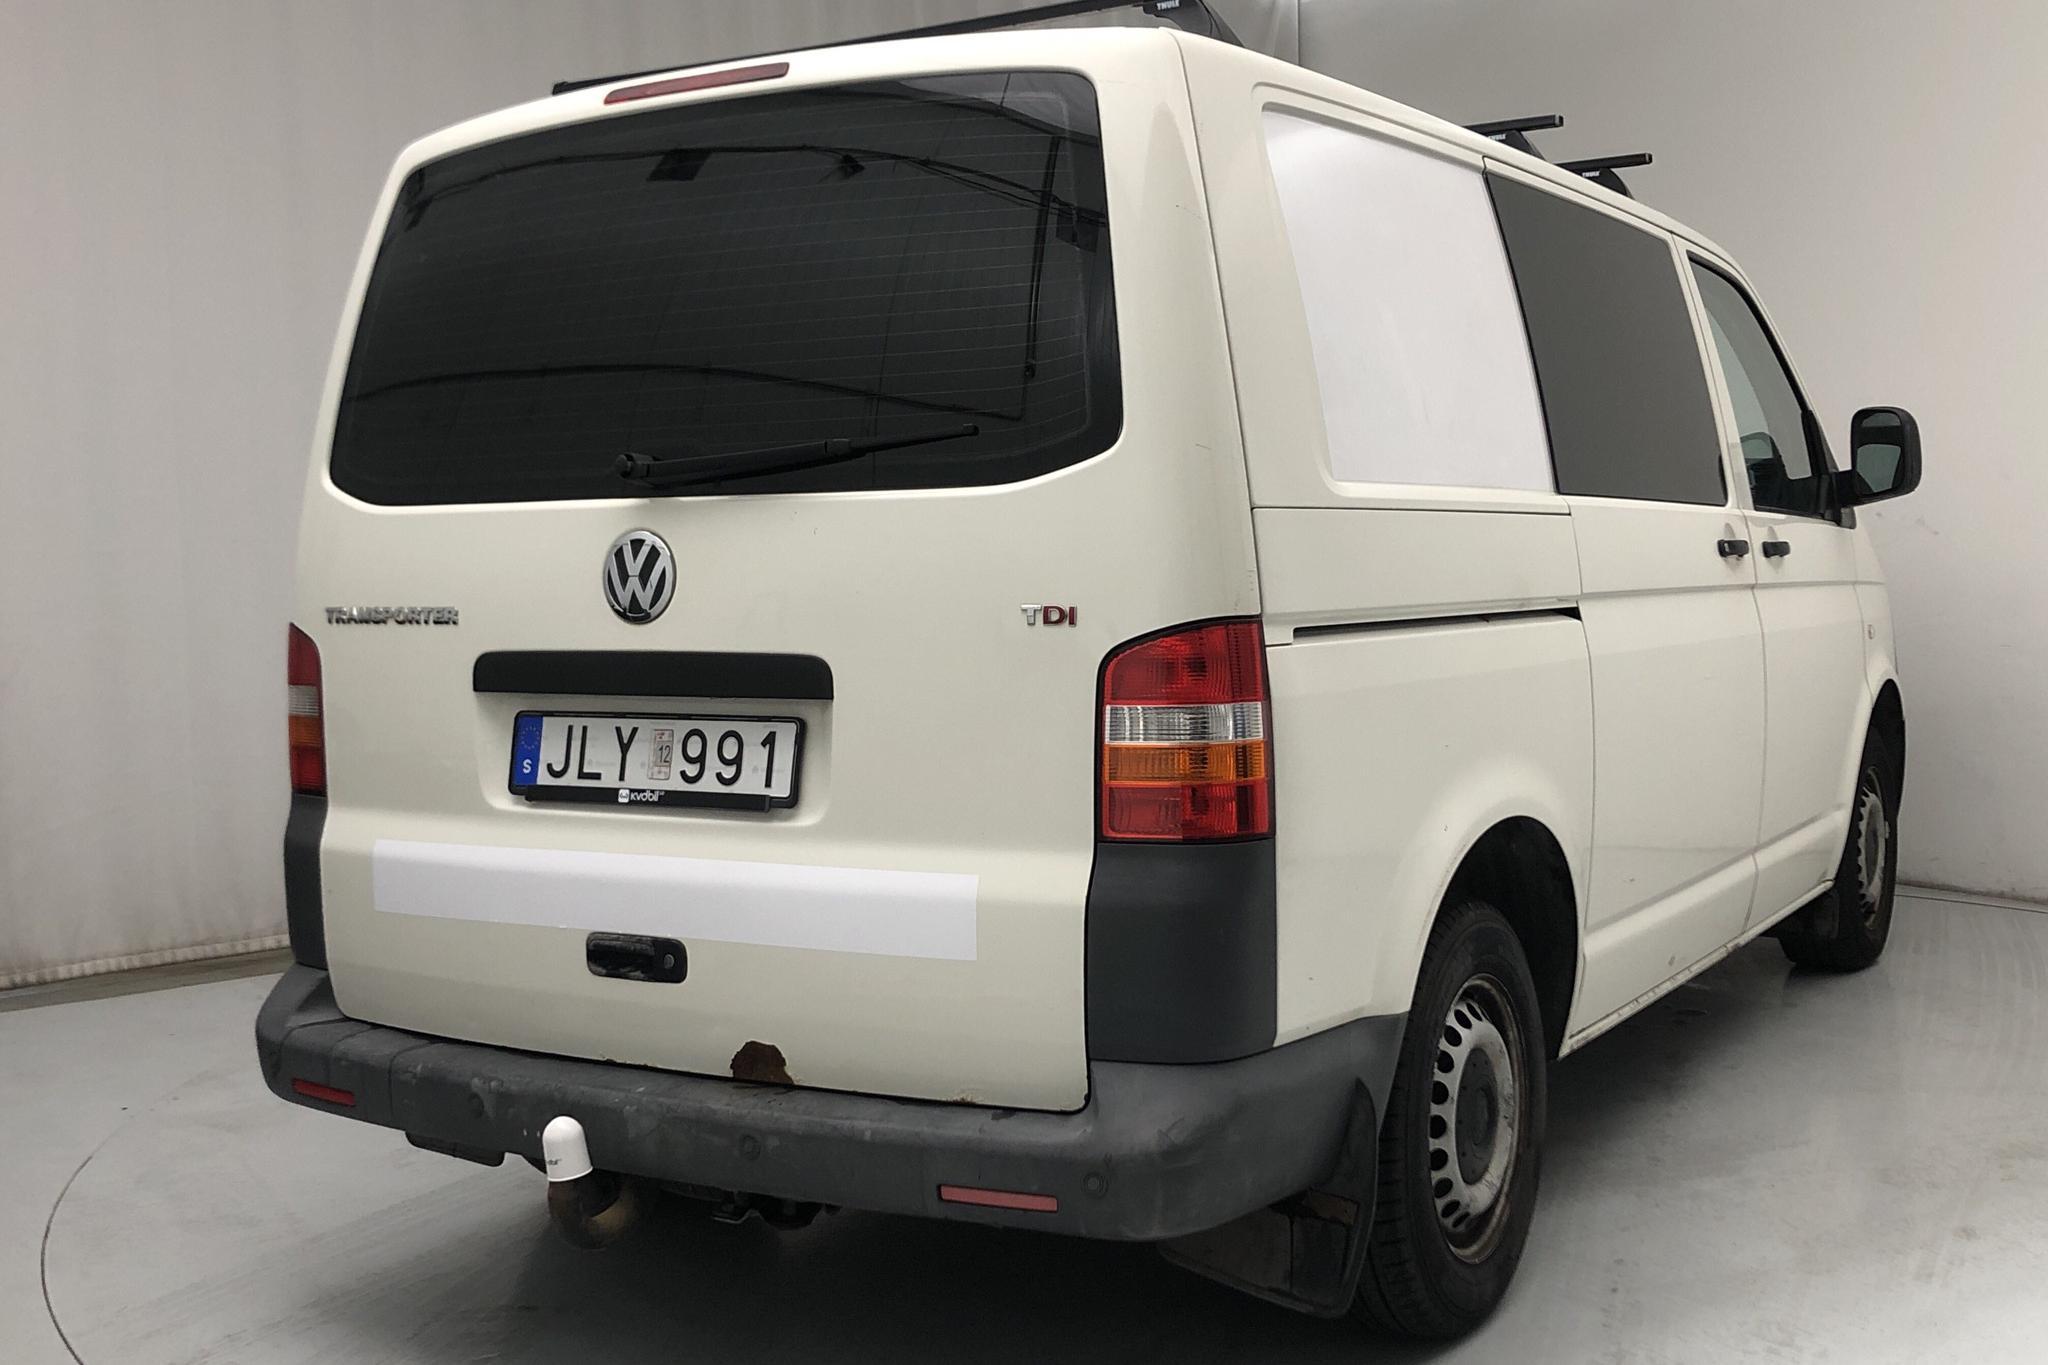 VW Transporter T5 2.5 TDI (130hk) - 117 380 km - Automatic - white - 2008